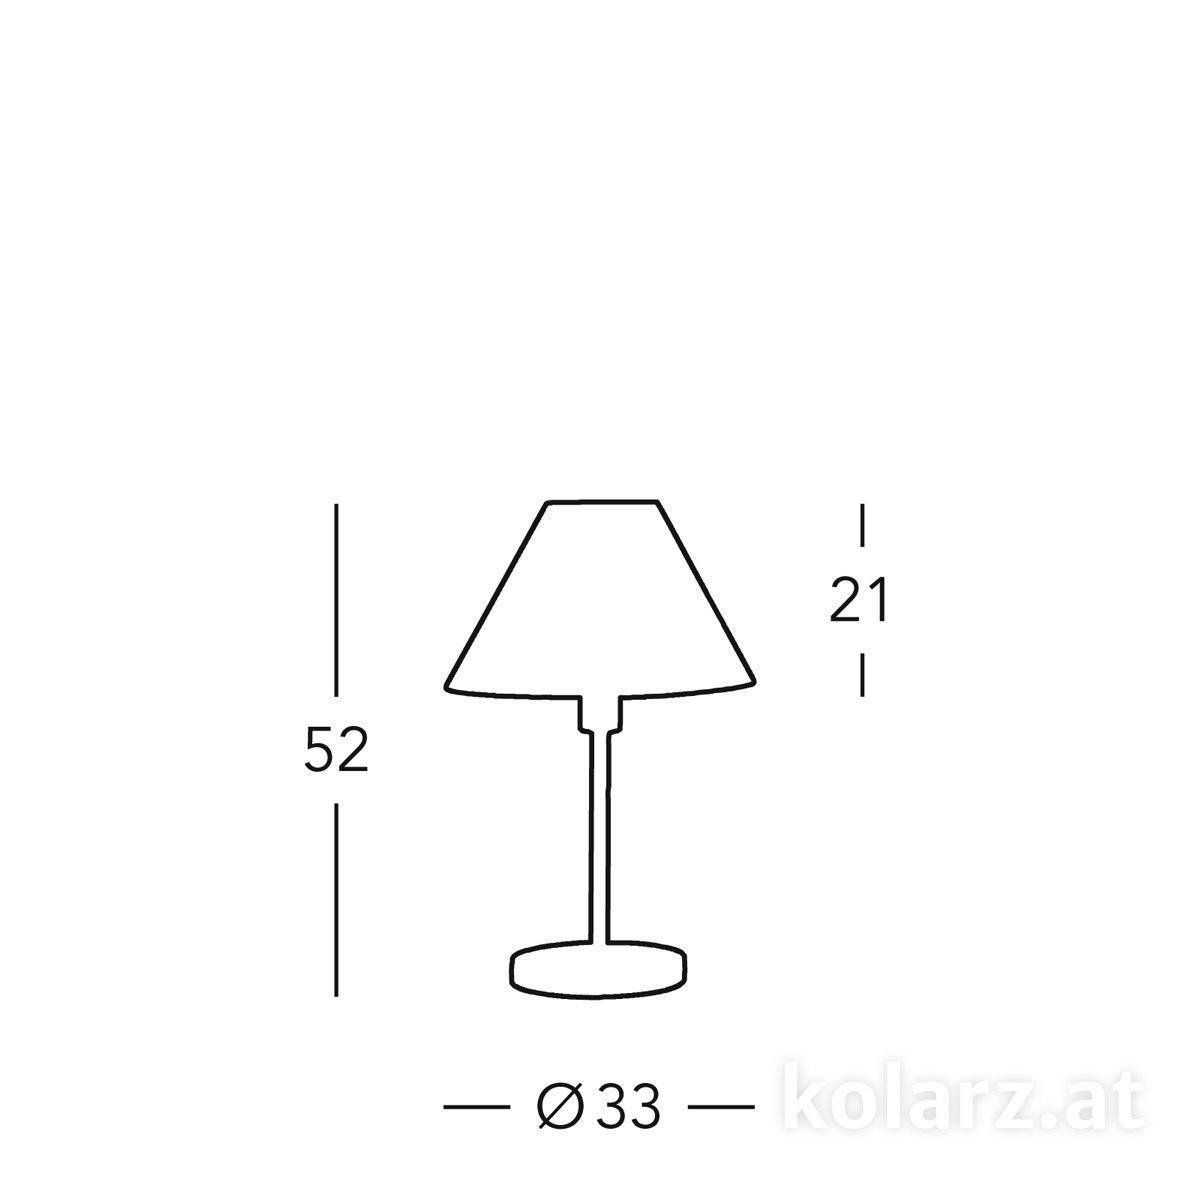 264-70-7-s1.jpg